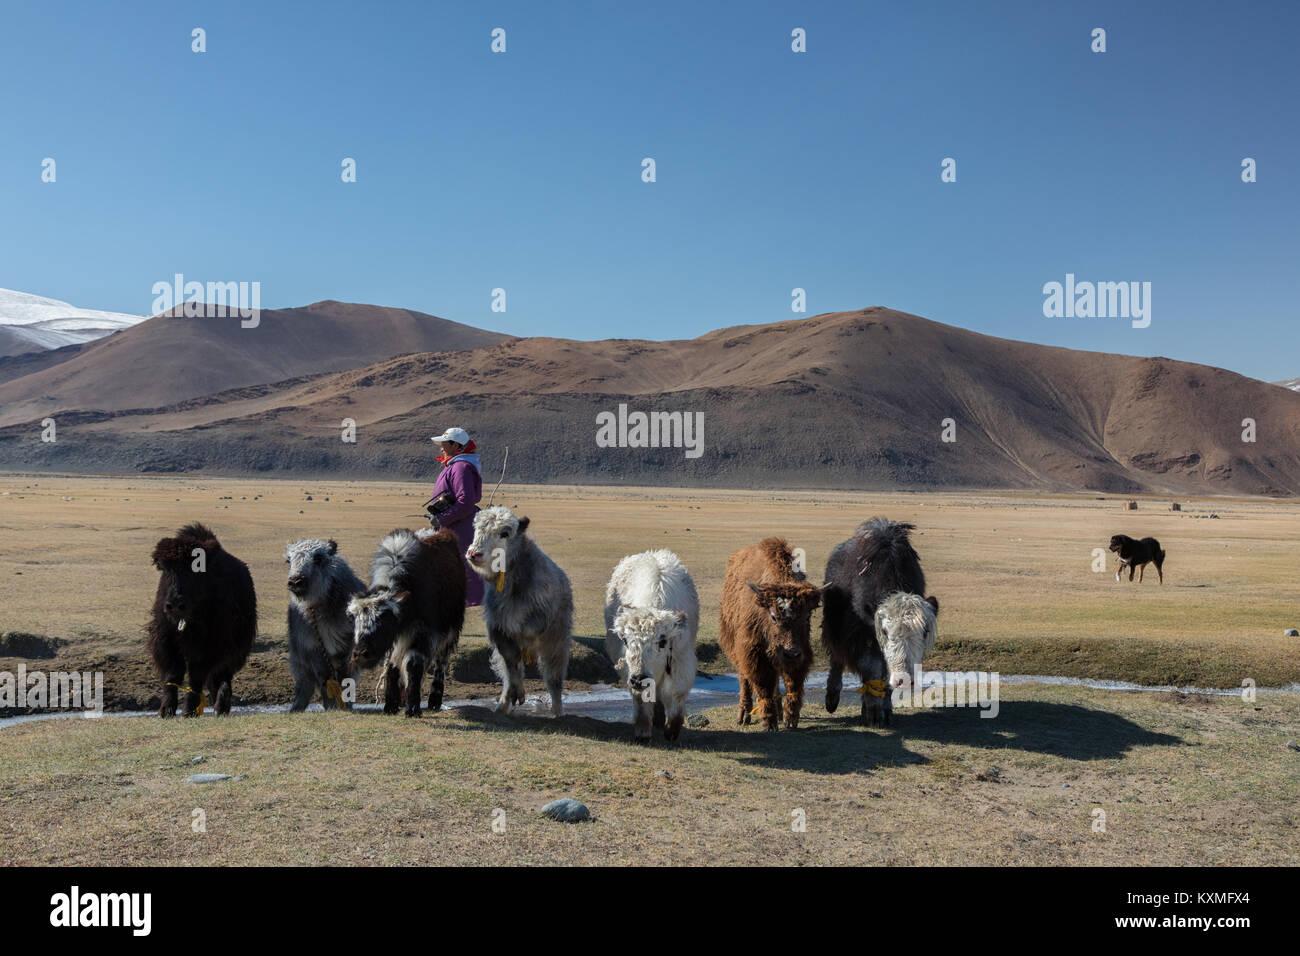 Mongolian black and white yaks dog shepherd woman herder Mongolia winter steppes grasslands plains - Stock Image